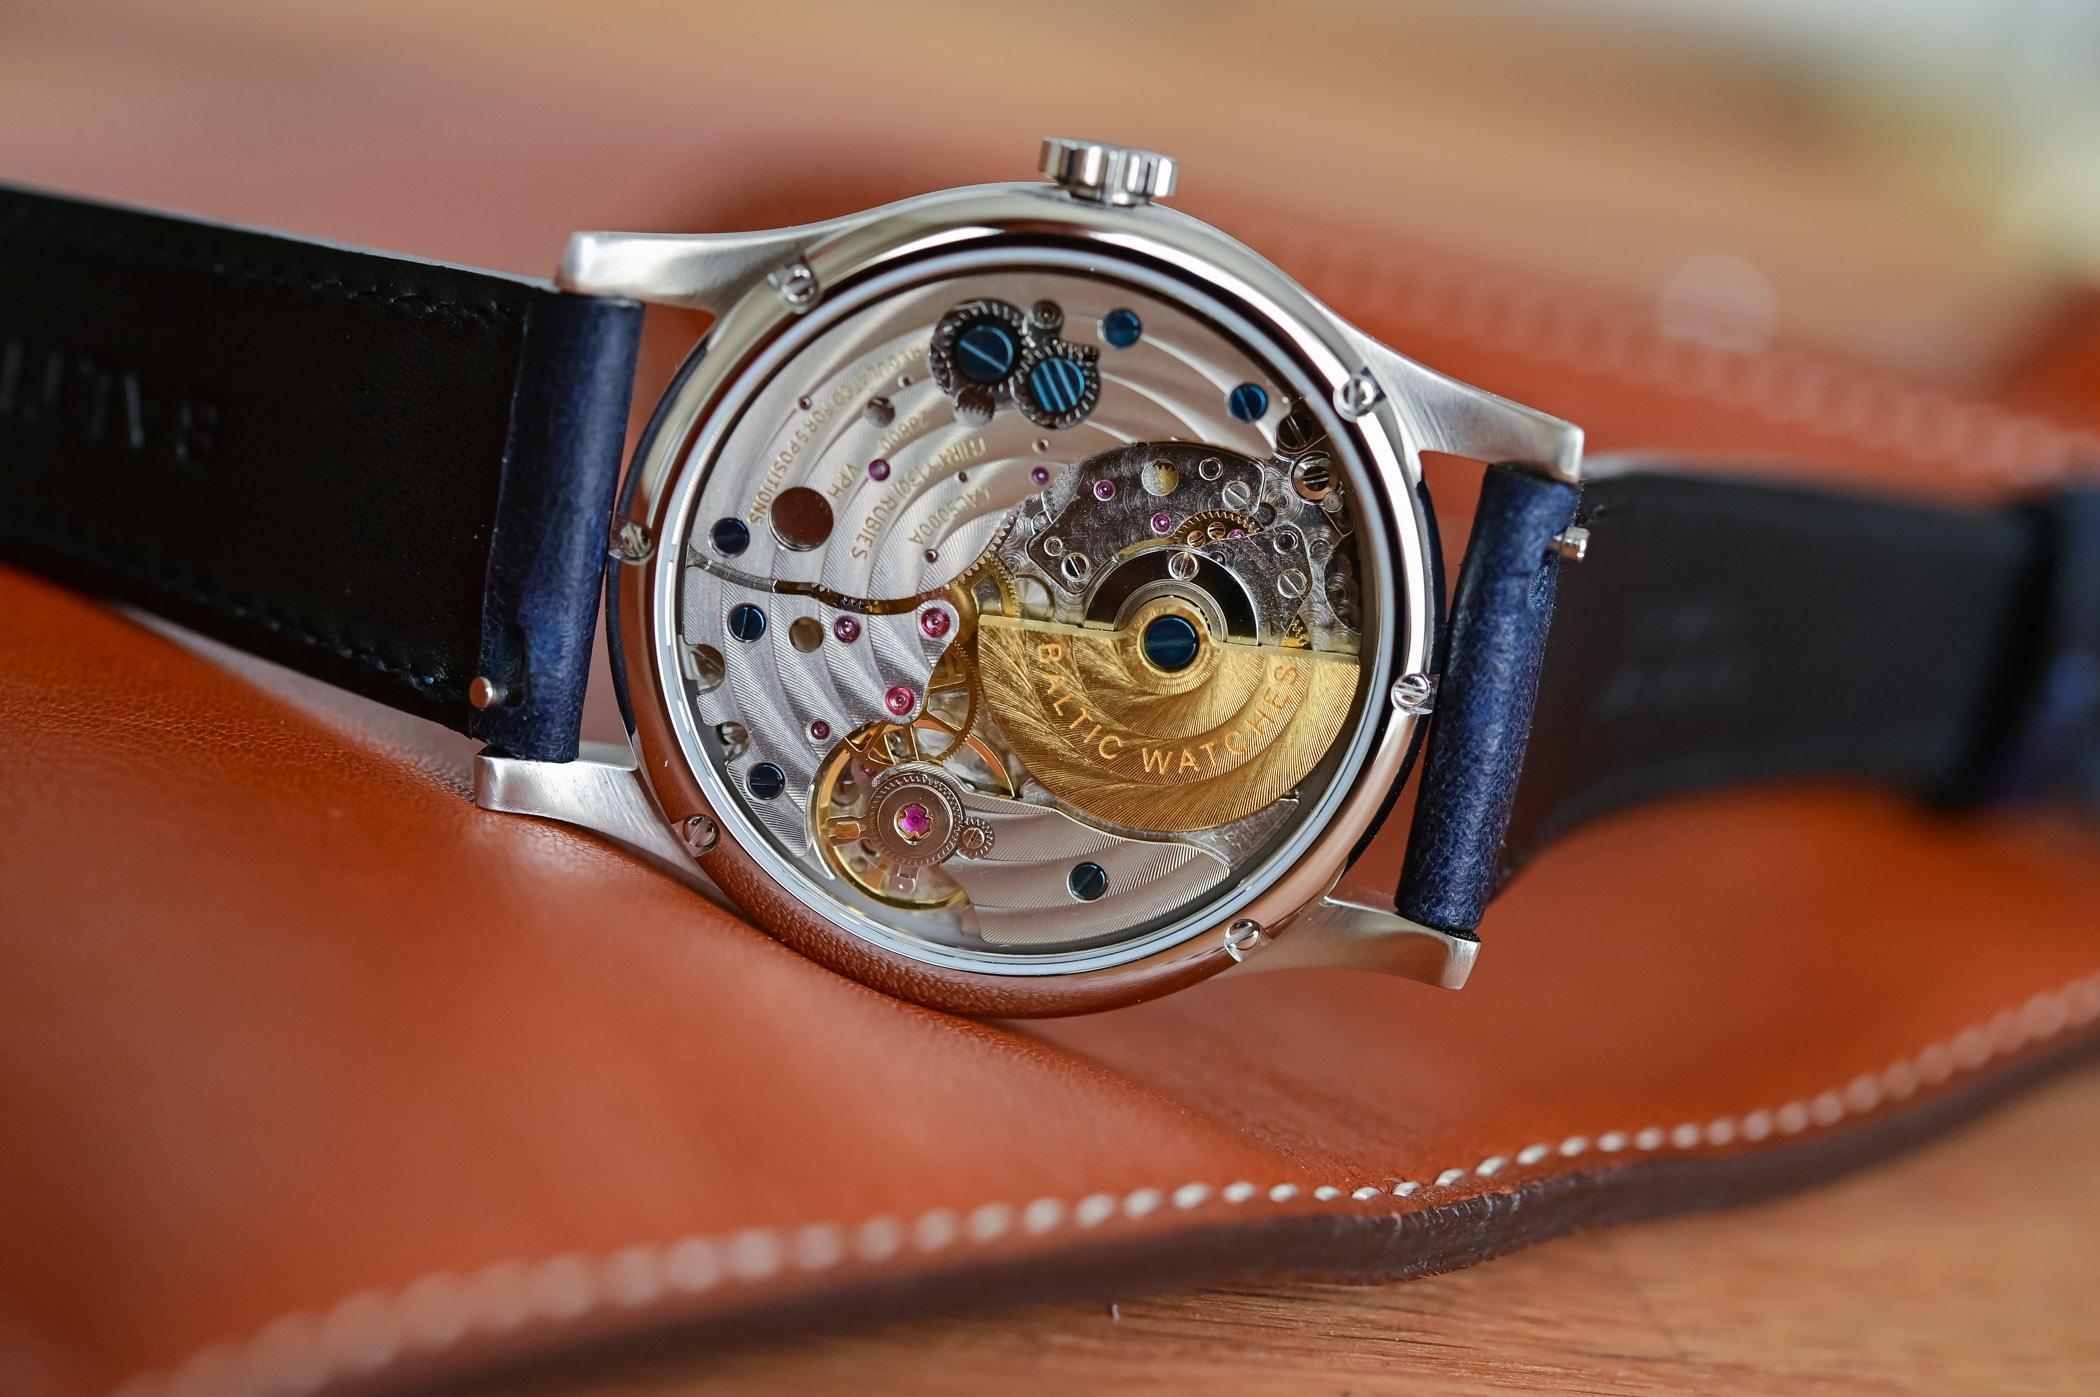 Baltic MR01 Salmon Accessible Calatrava-style Micro Rotor Watch